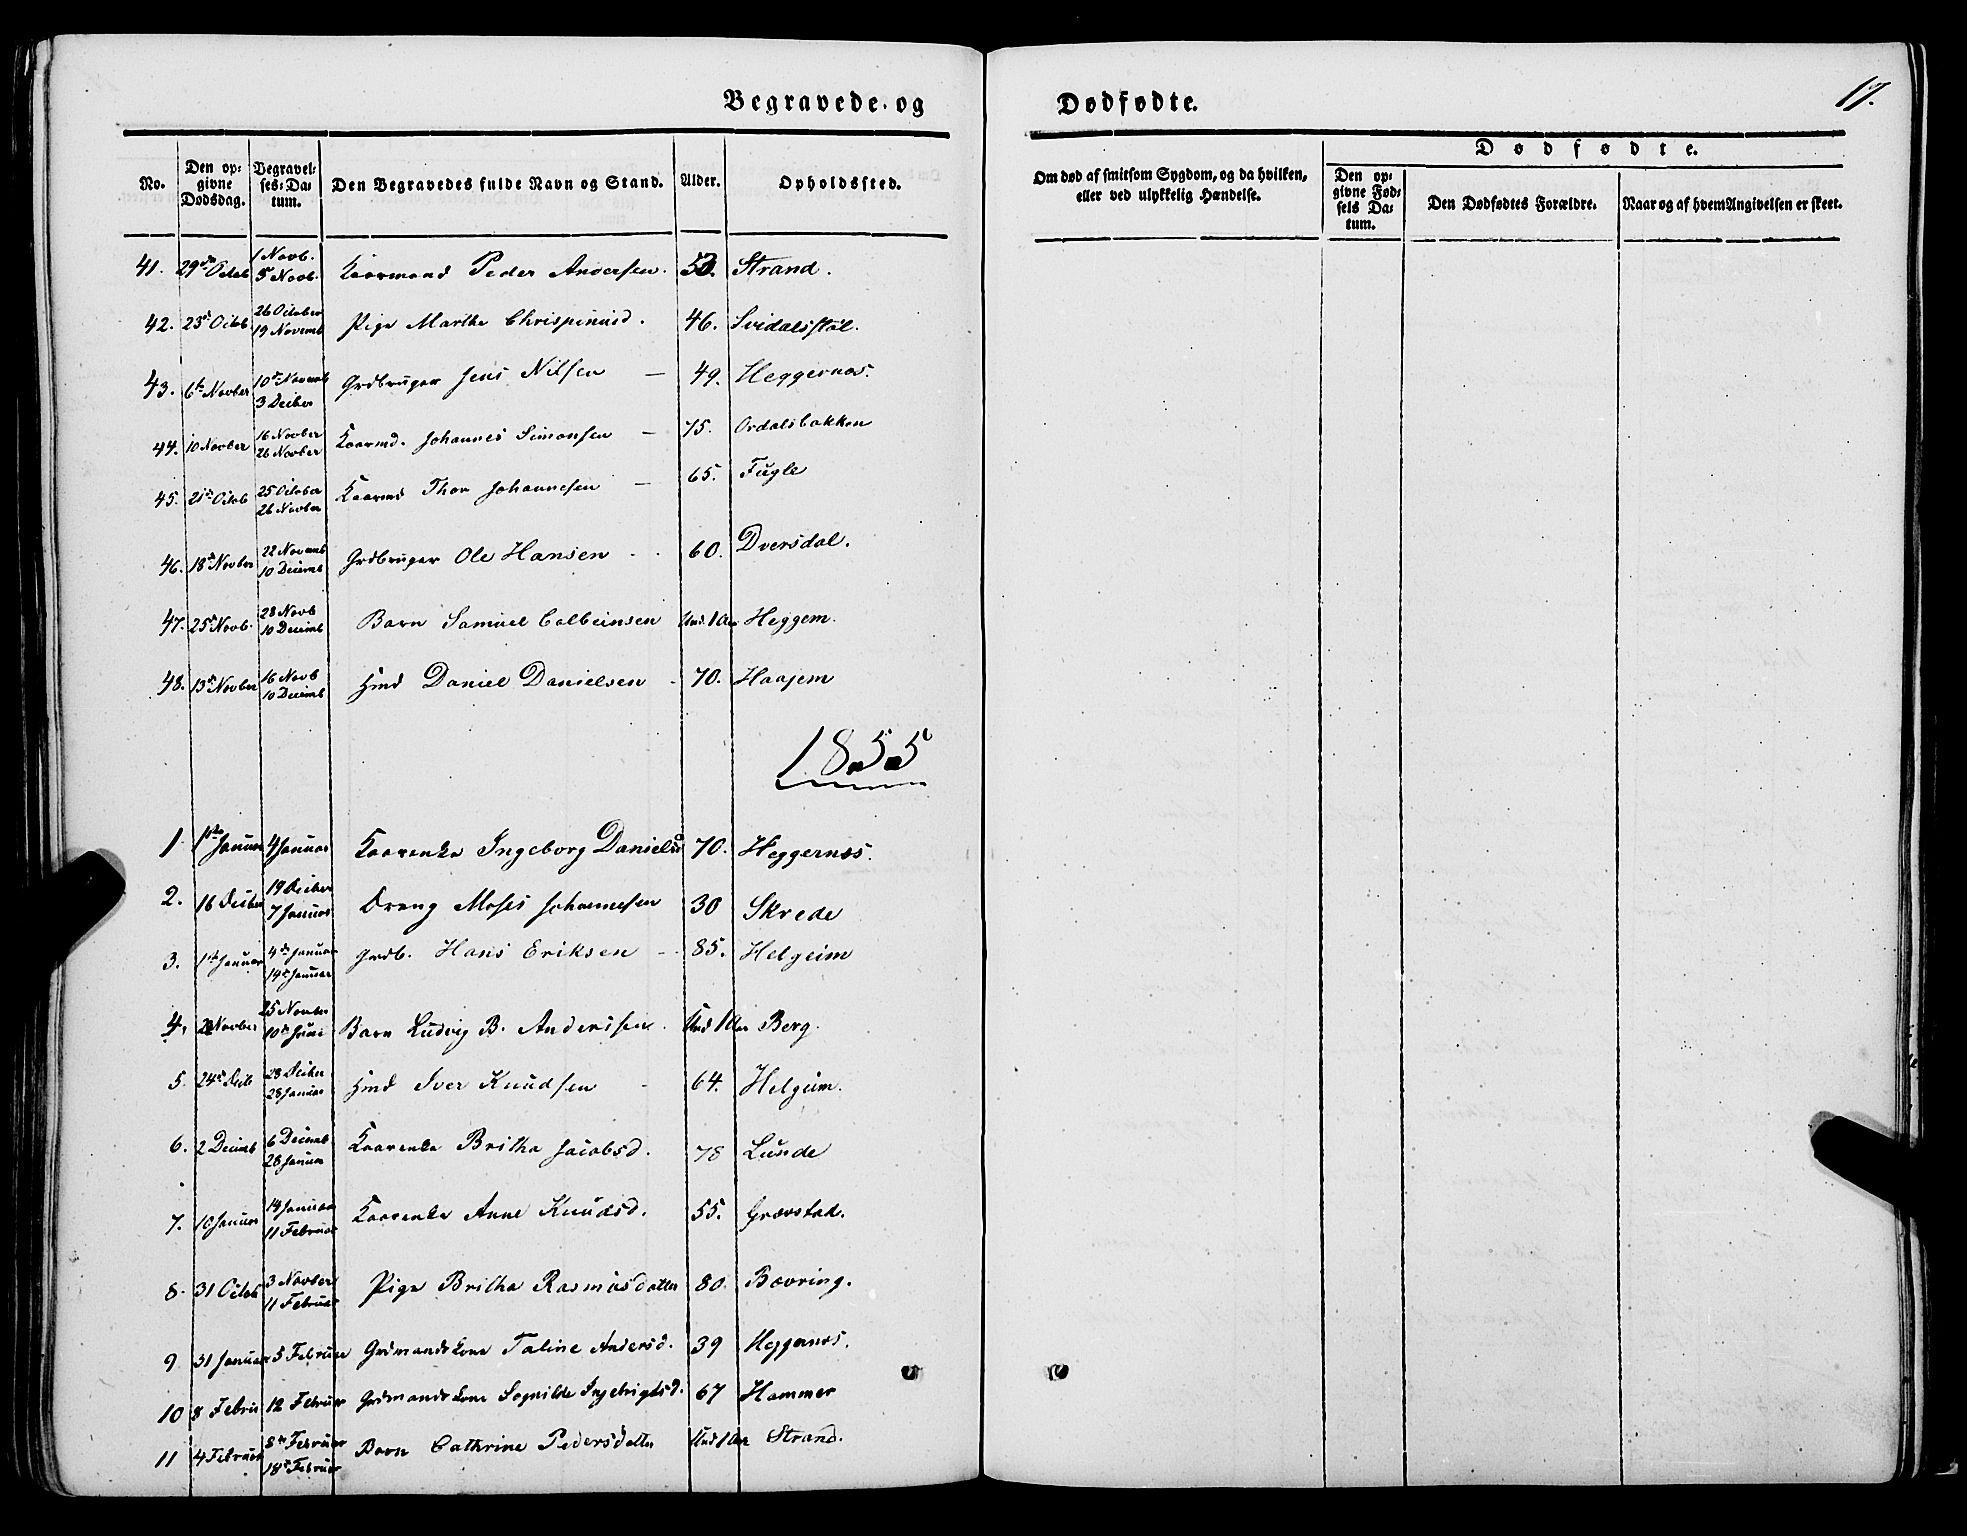 SAB, Jølster sokneprestembete, H/Haa/Haaa/L0010: Parish register (official) no. A 10, 1847-1865, p. 17